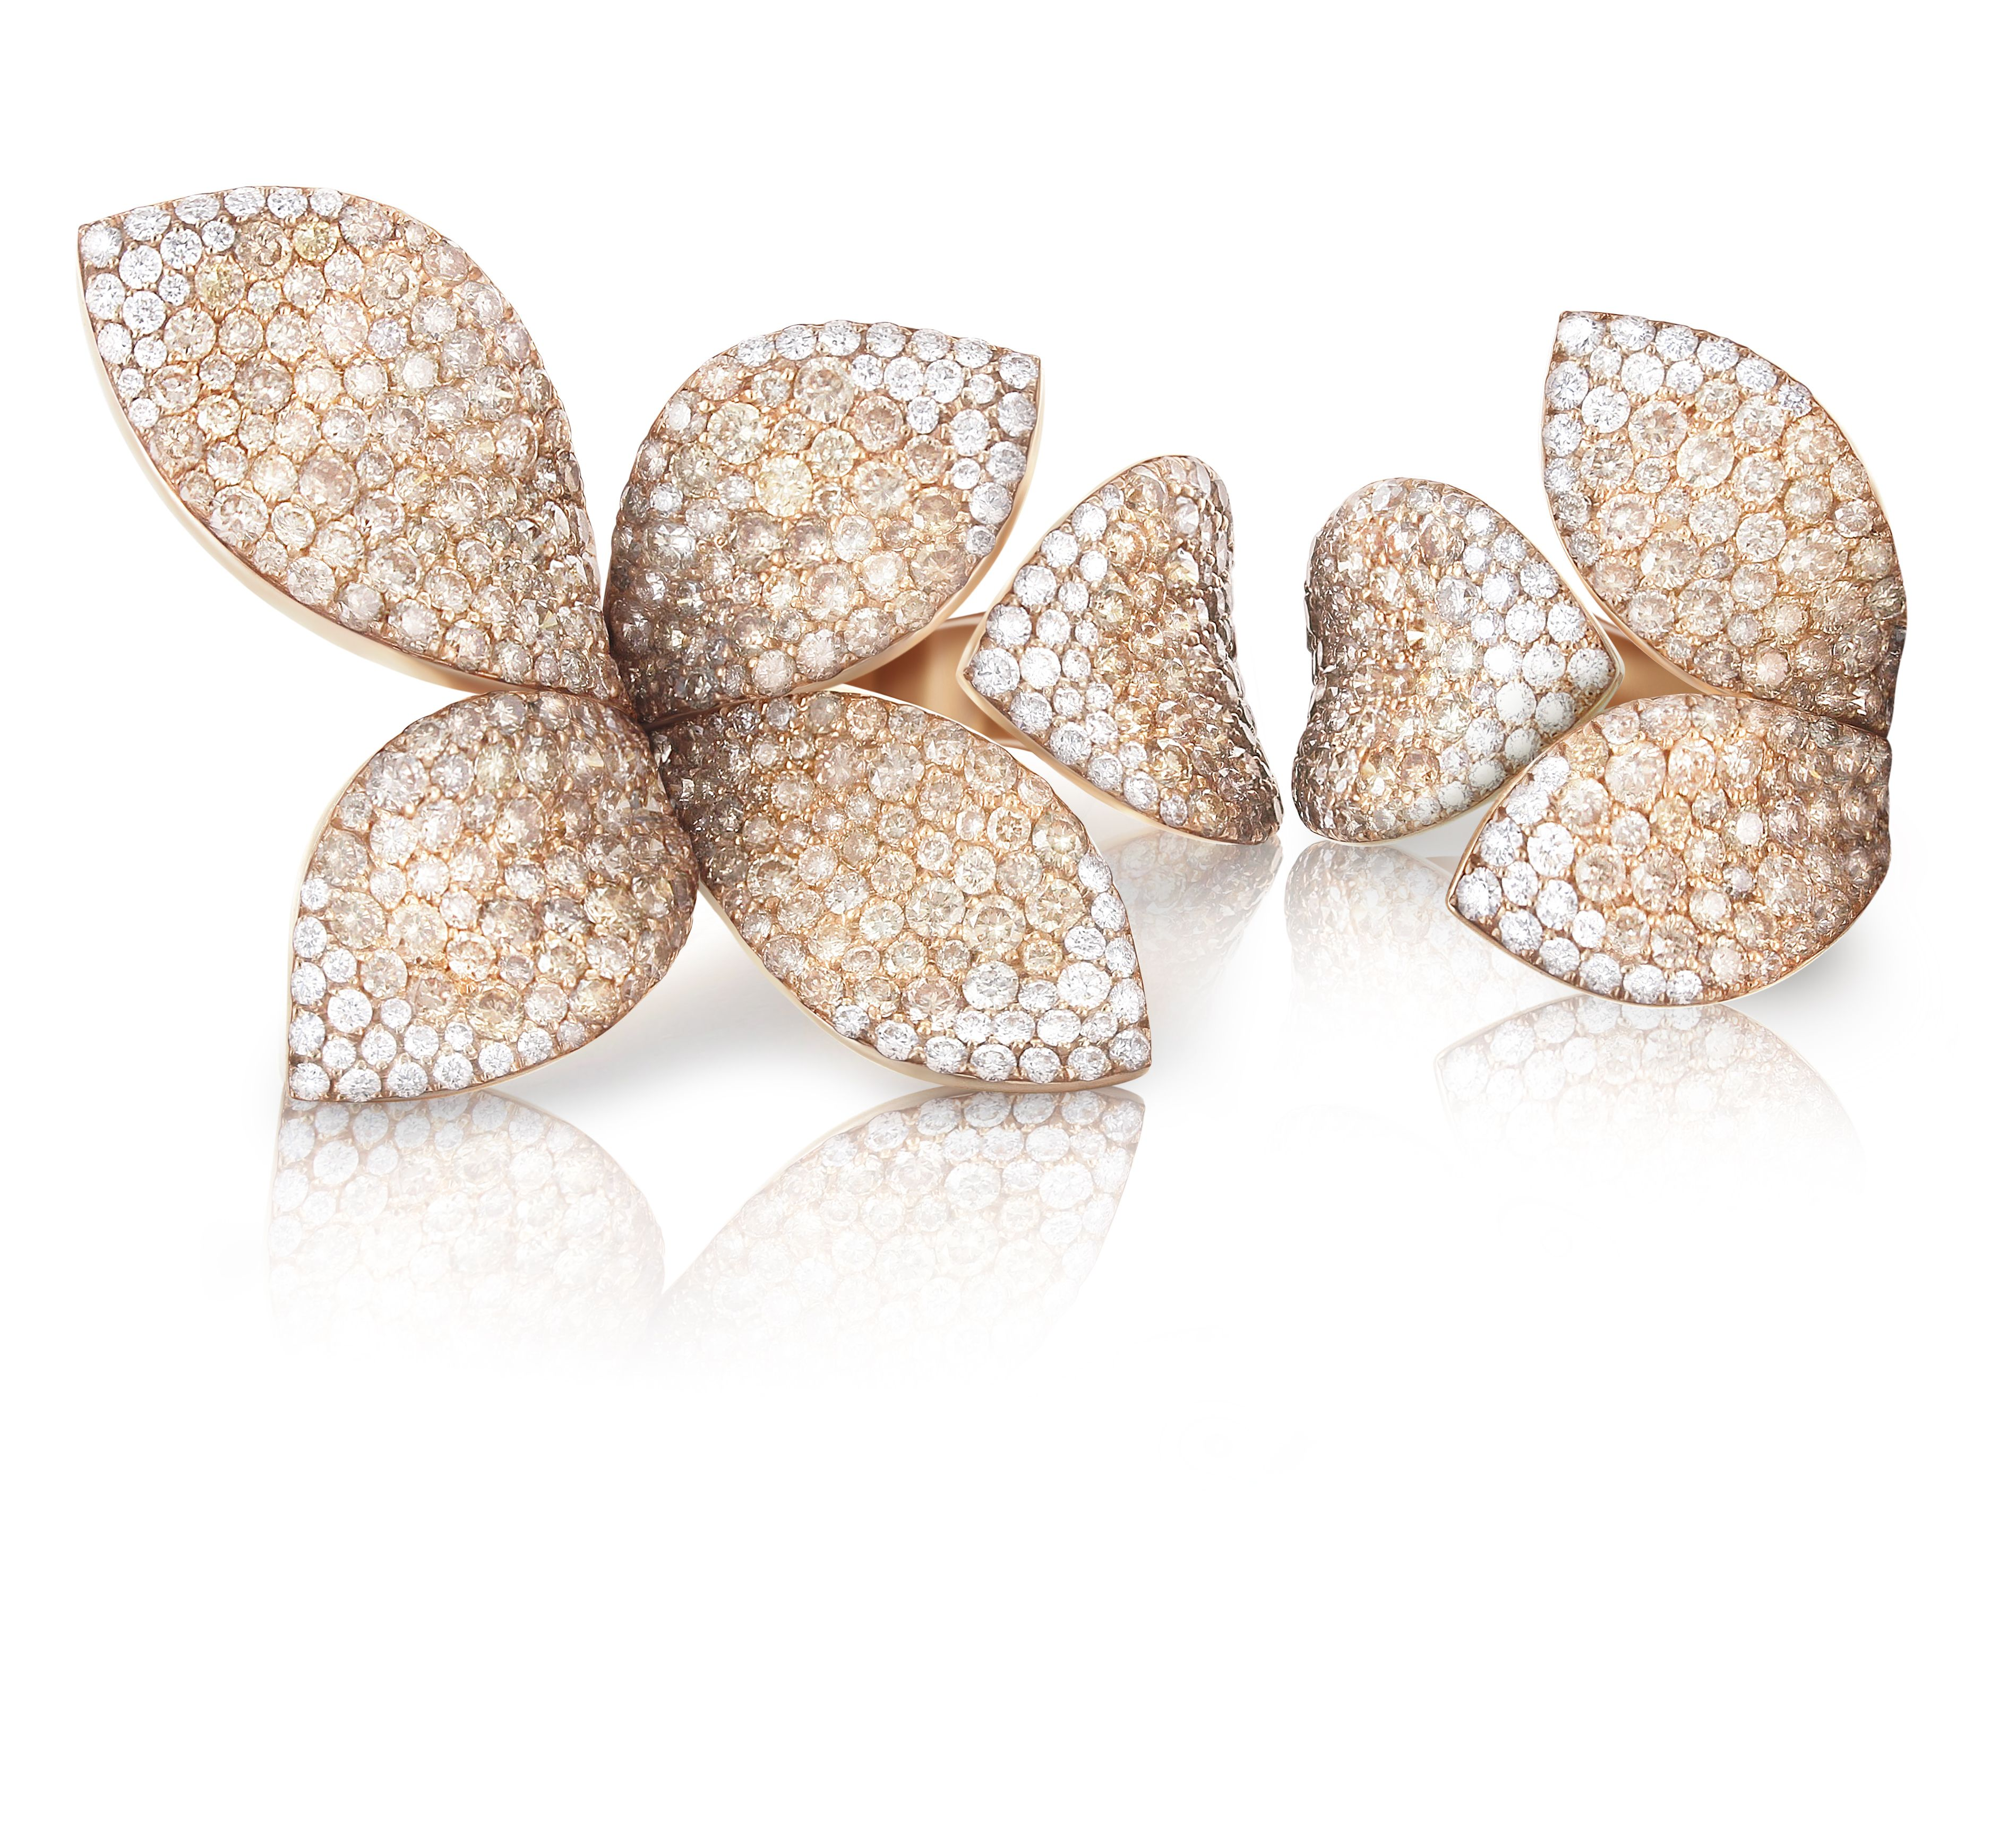 Pasquale Bruni Giardini Secreti 18K White Gold Diamond Petal Ring VSKAo